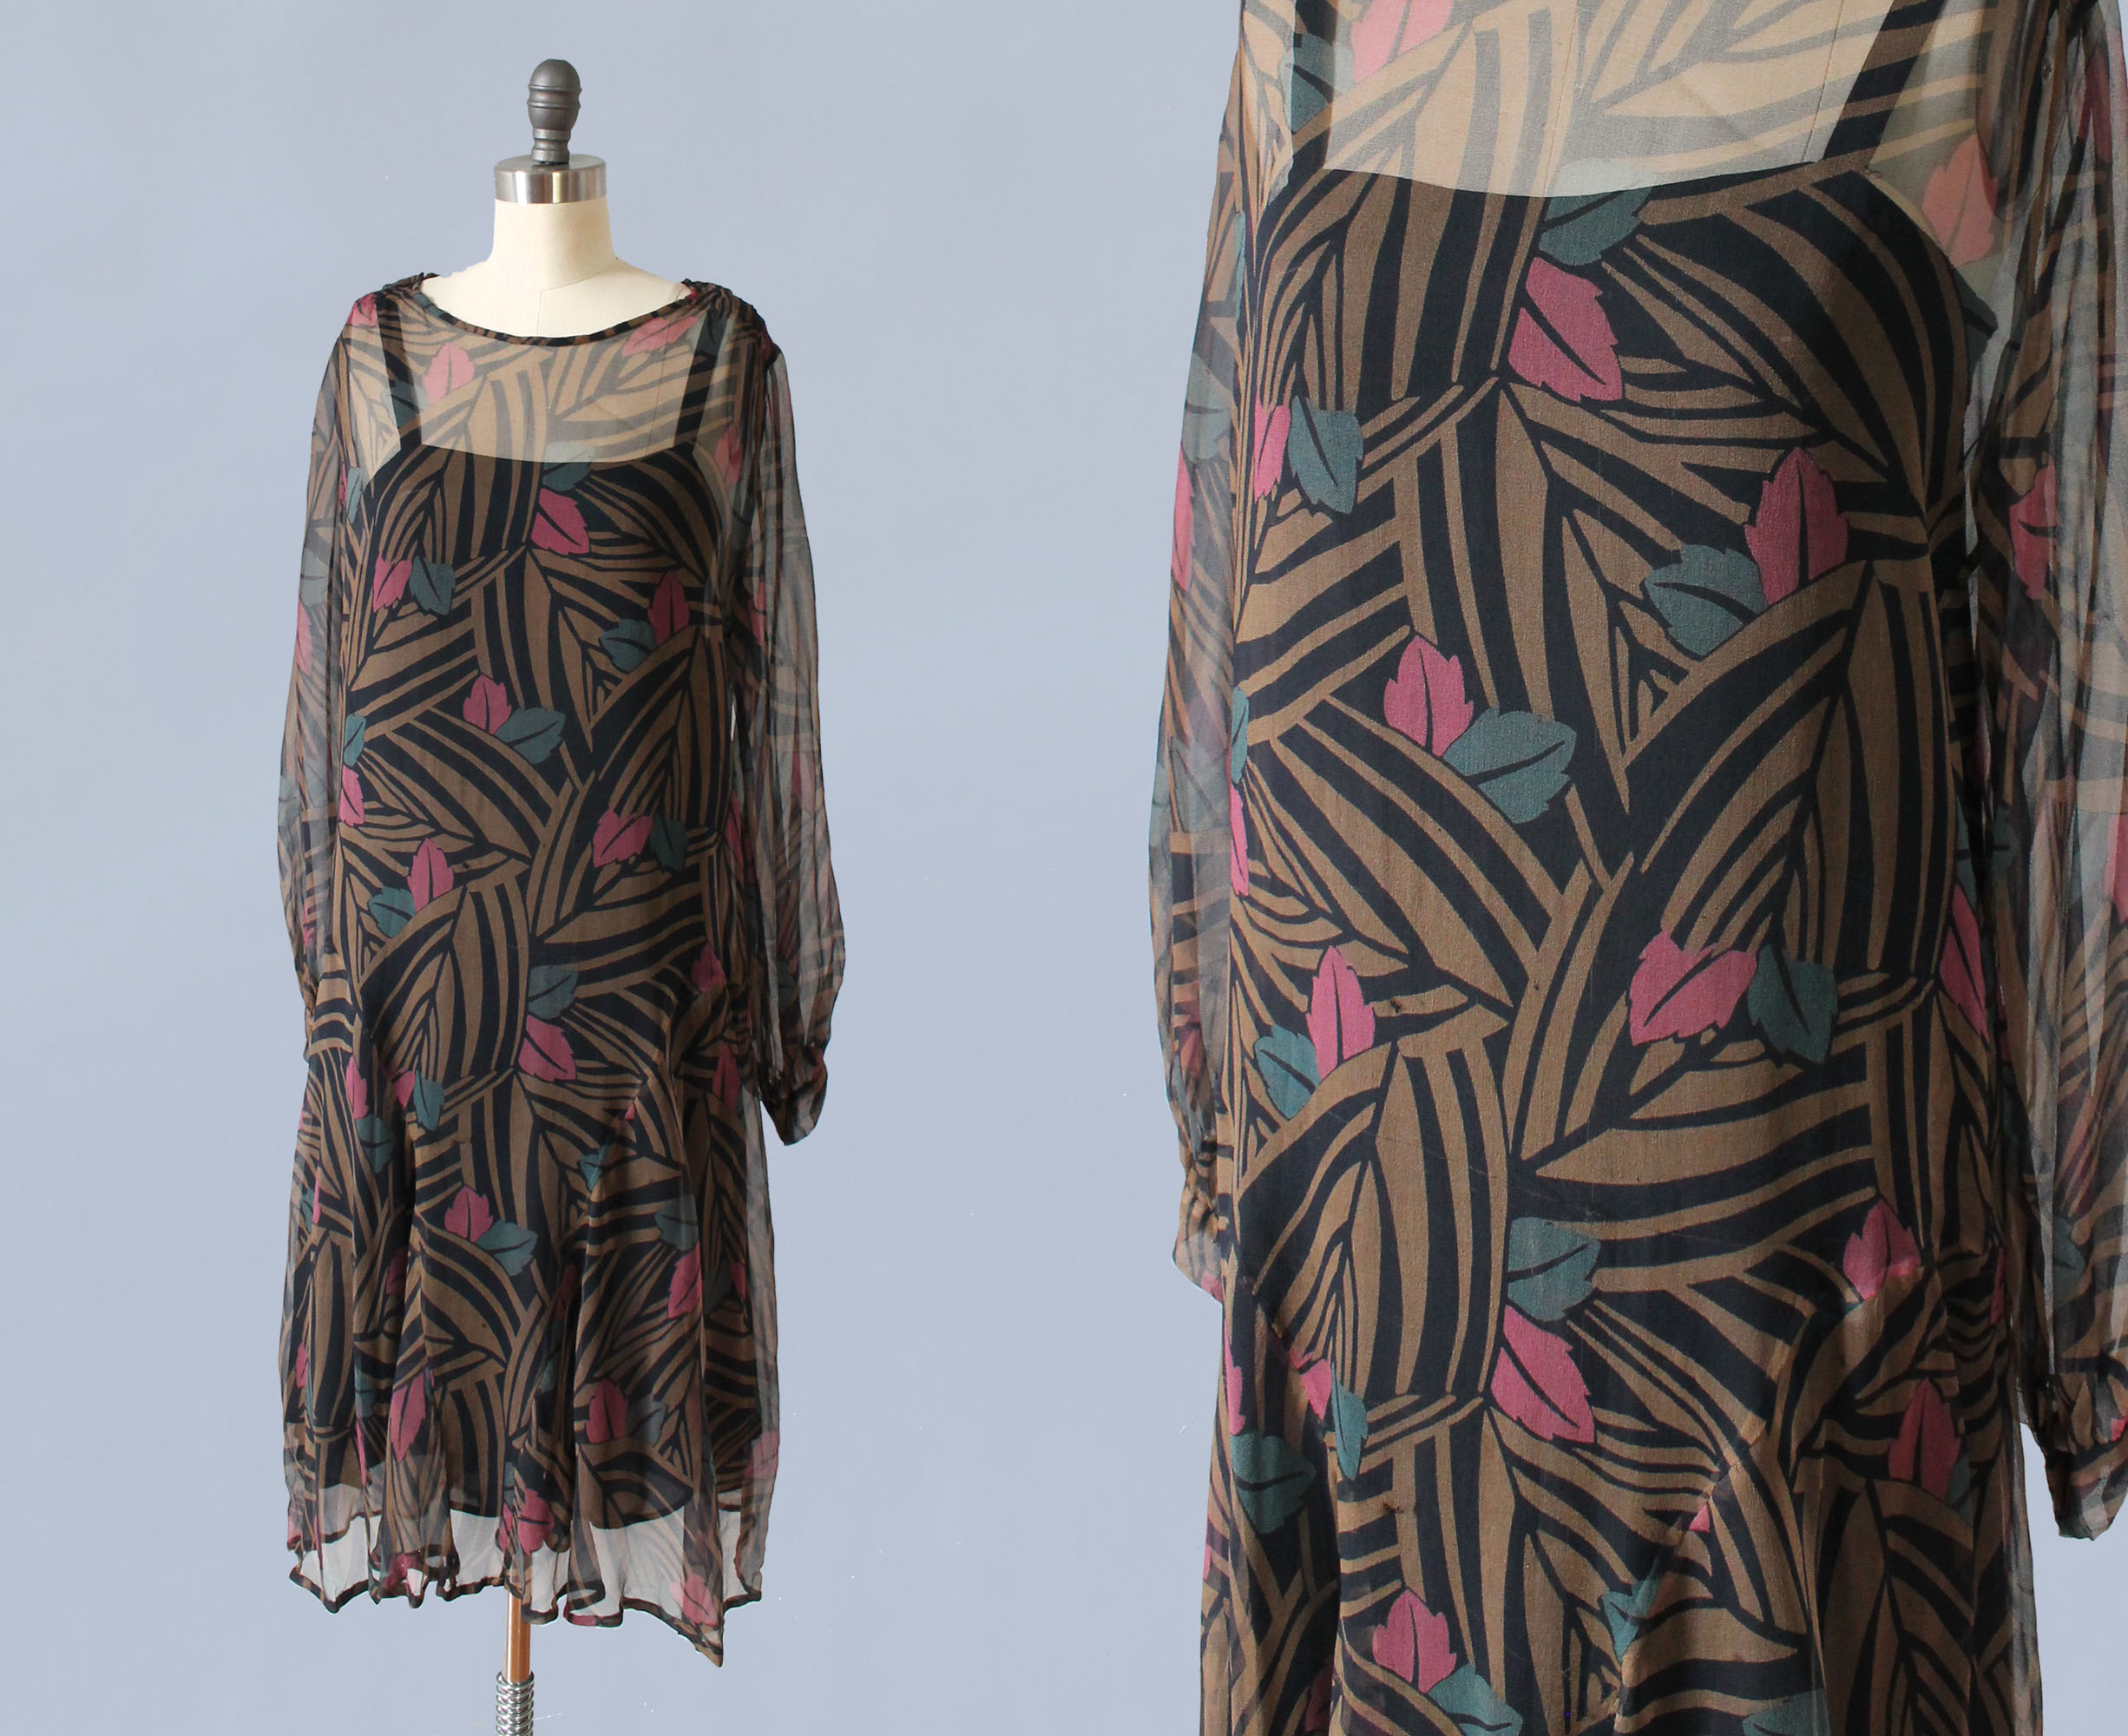 Deco printed silk dress. 1920s.